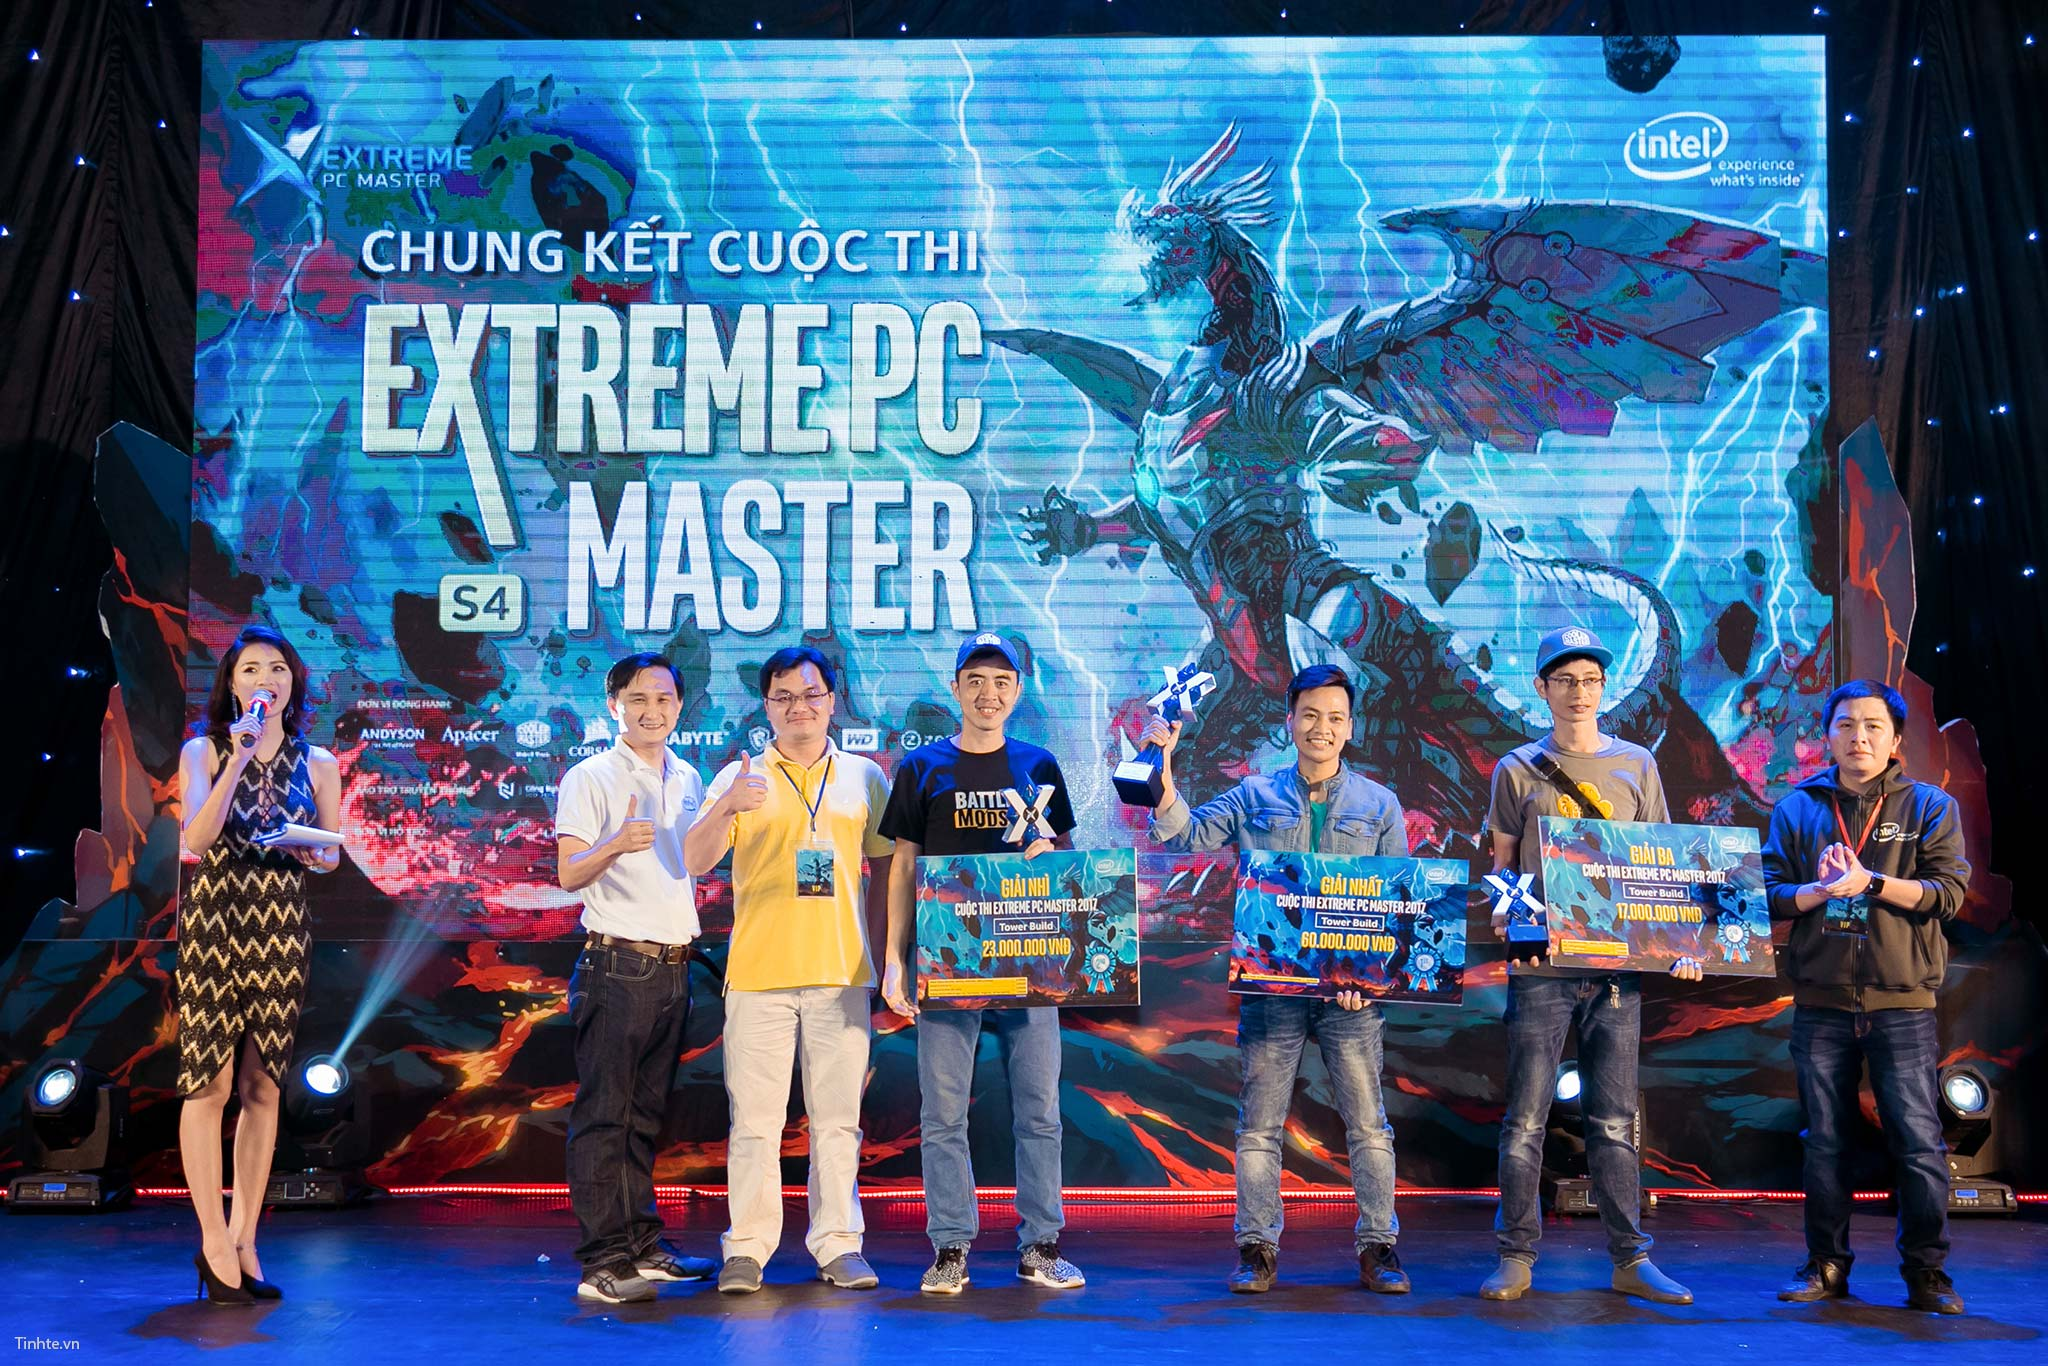 Intel Extreme PC Master_4.jpg